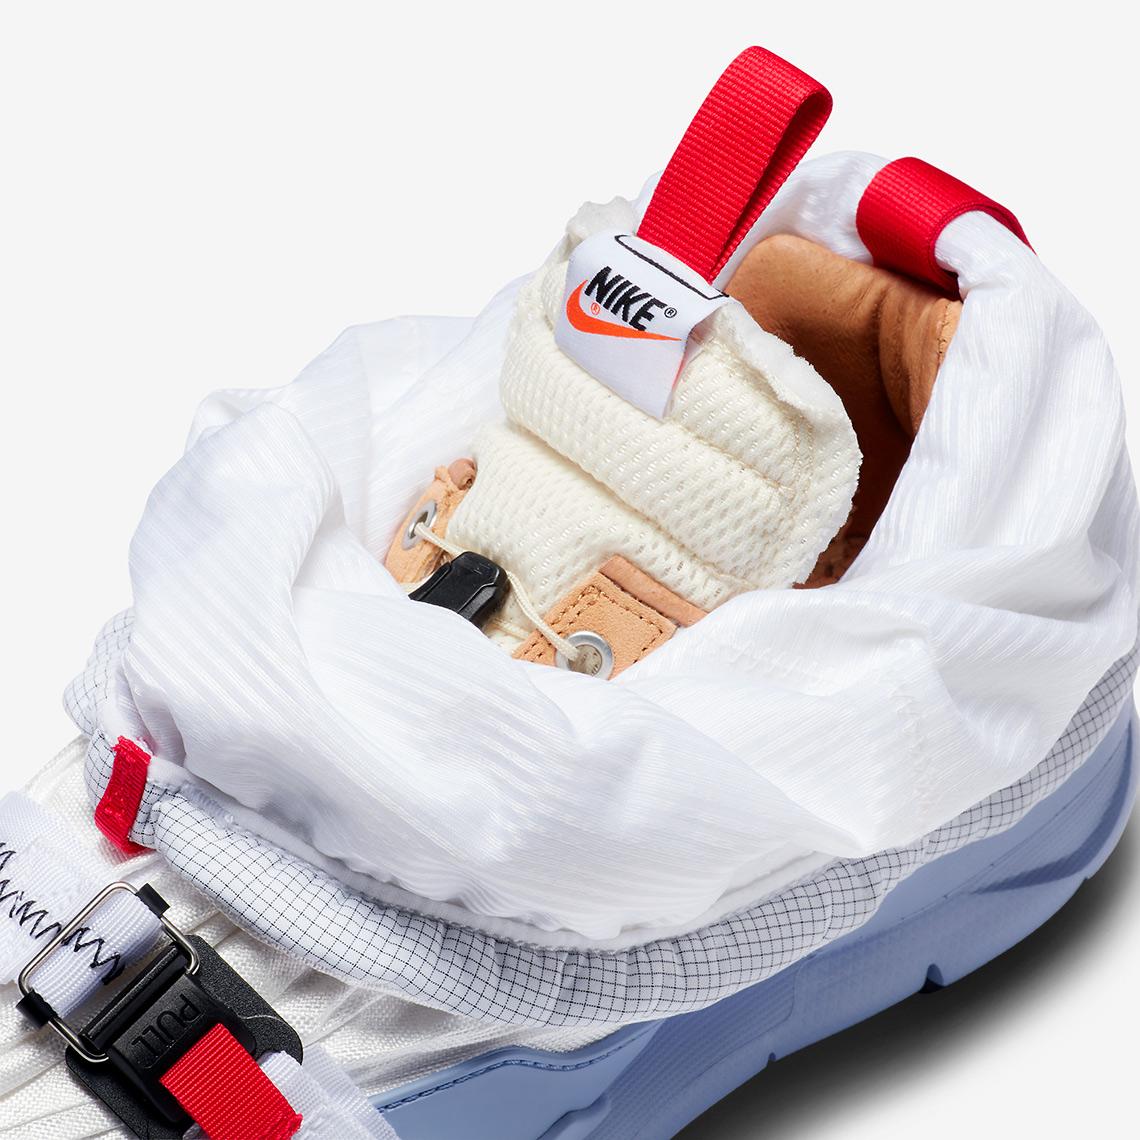 on sale 341e2 d645a Tom Sachs Nike Mars Yard Overshoe AH7767-101 Release   SneakerNews.com